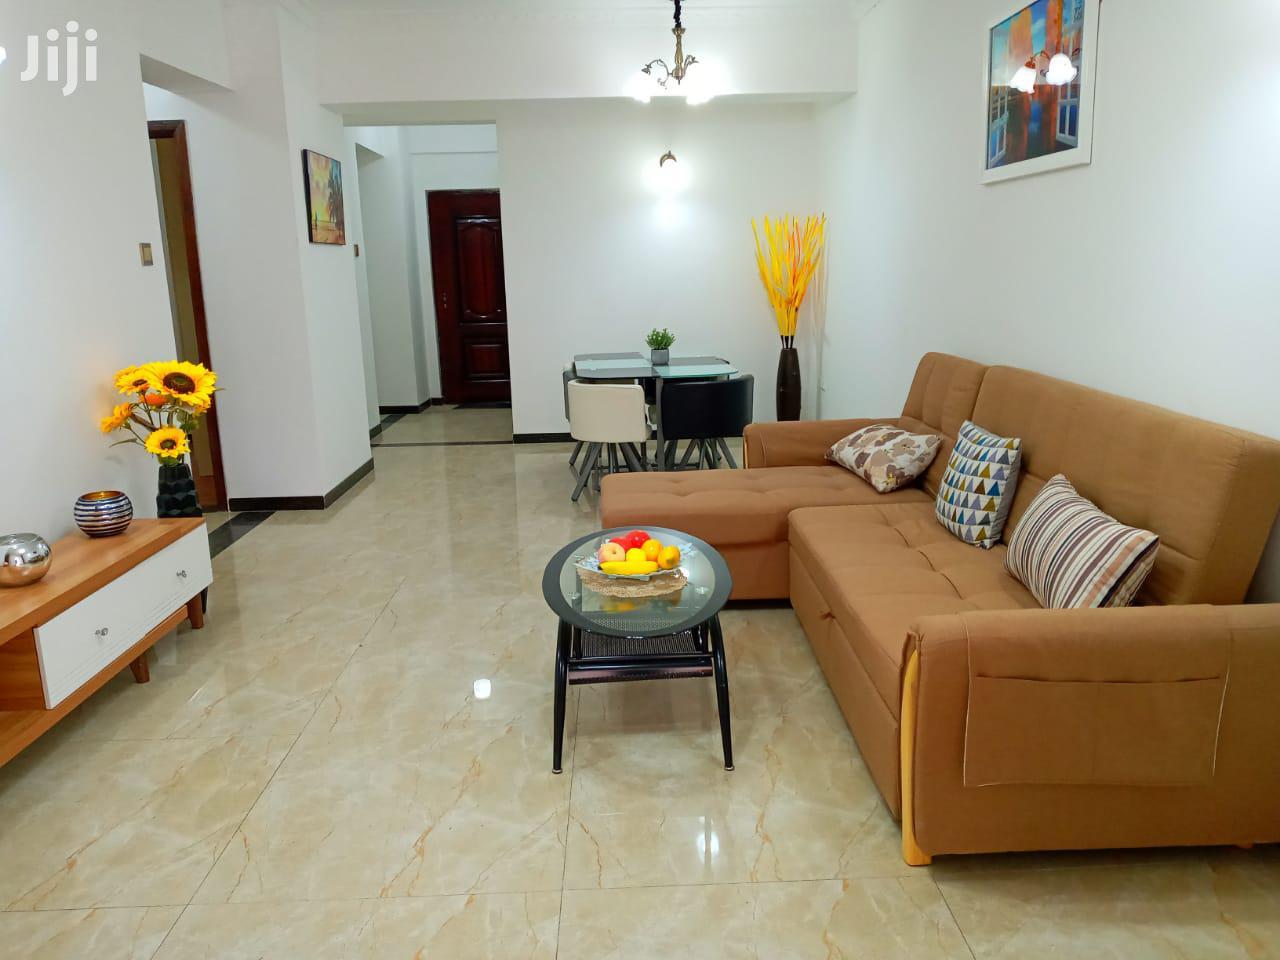 Hot Sale Brand New 3 Bedroom Master Ensuite In Kilimani